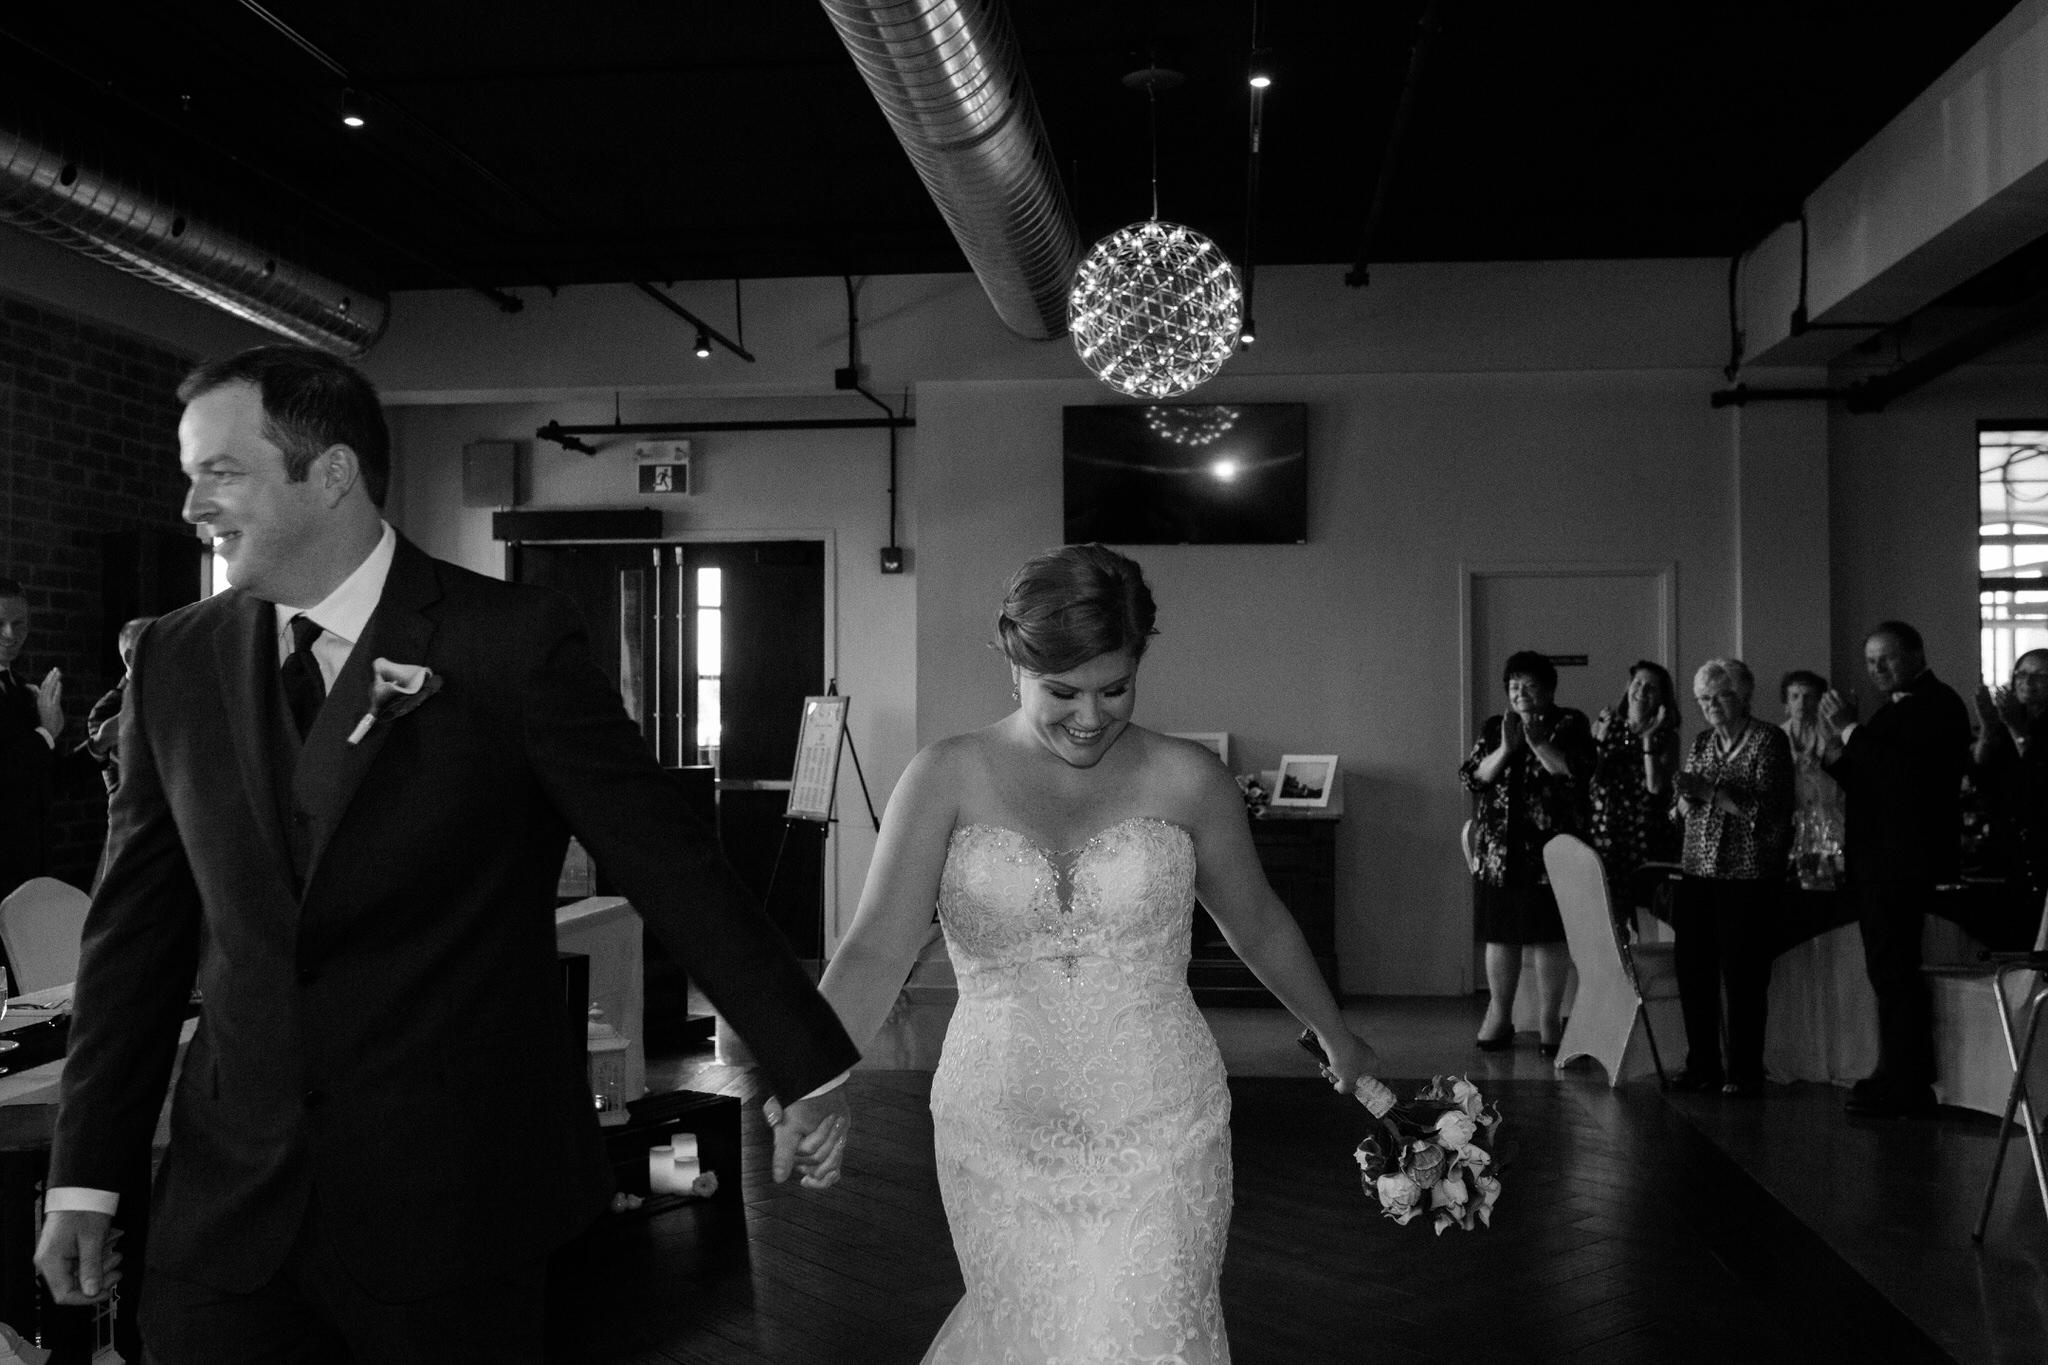 Brock Street Brewing Co. Wedding - bride and groom entrance